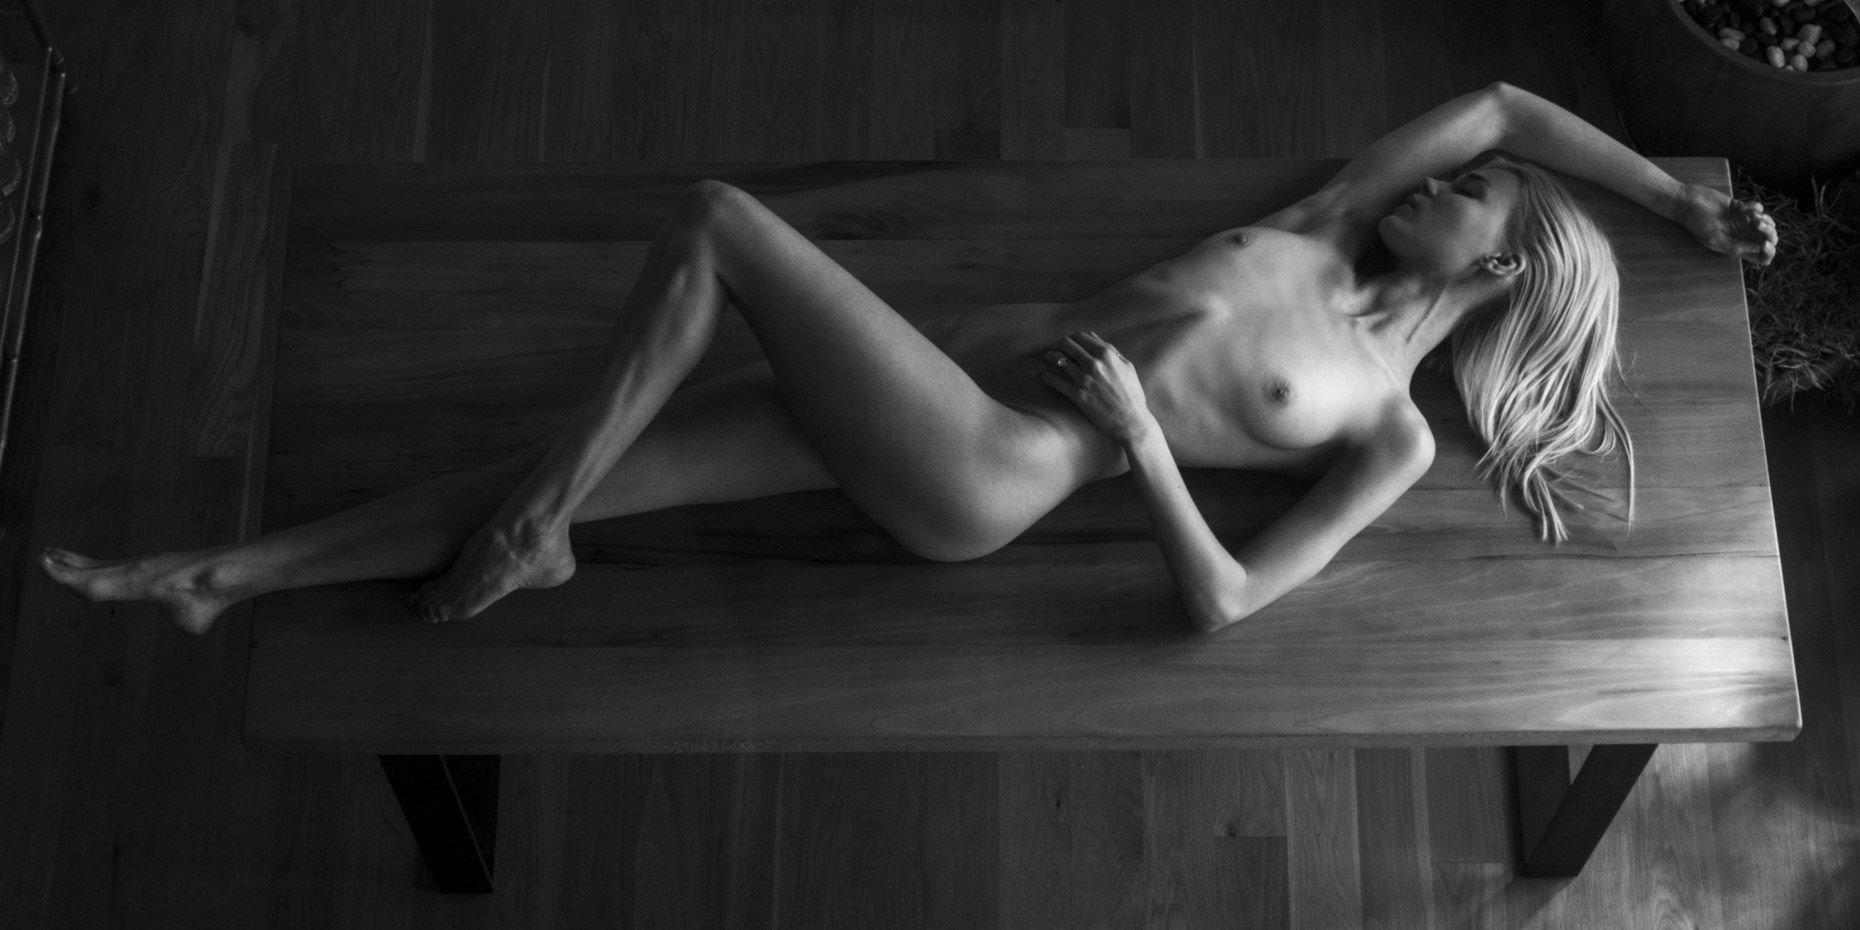 Anouk taylor nude